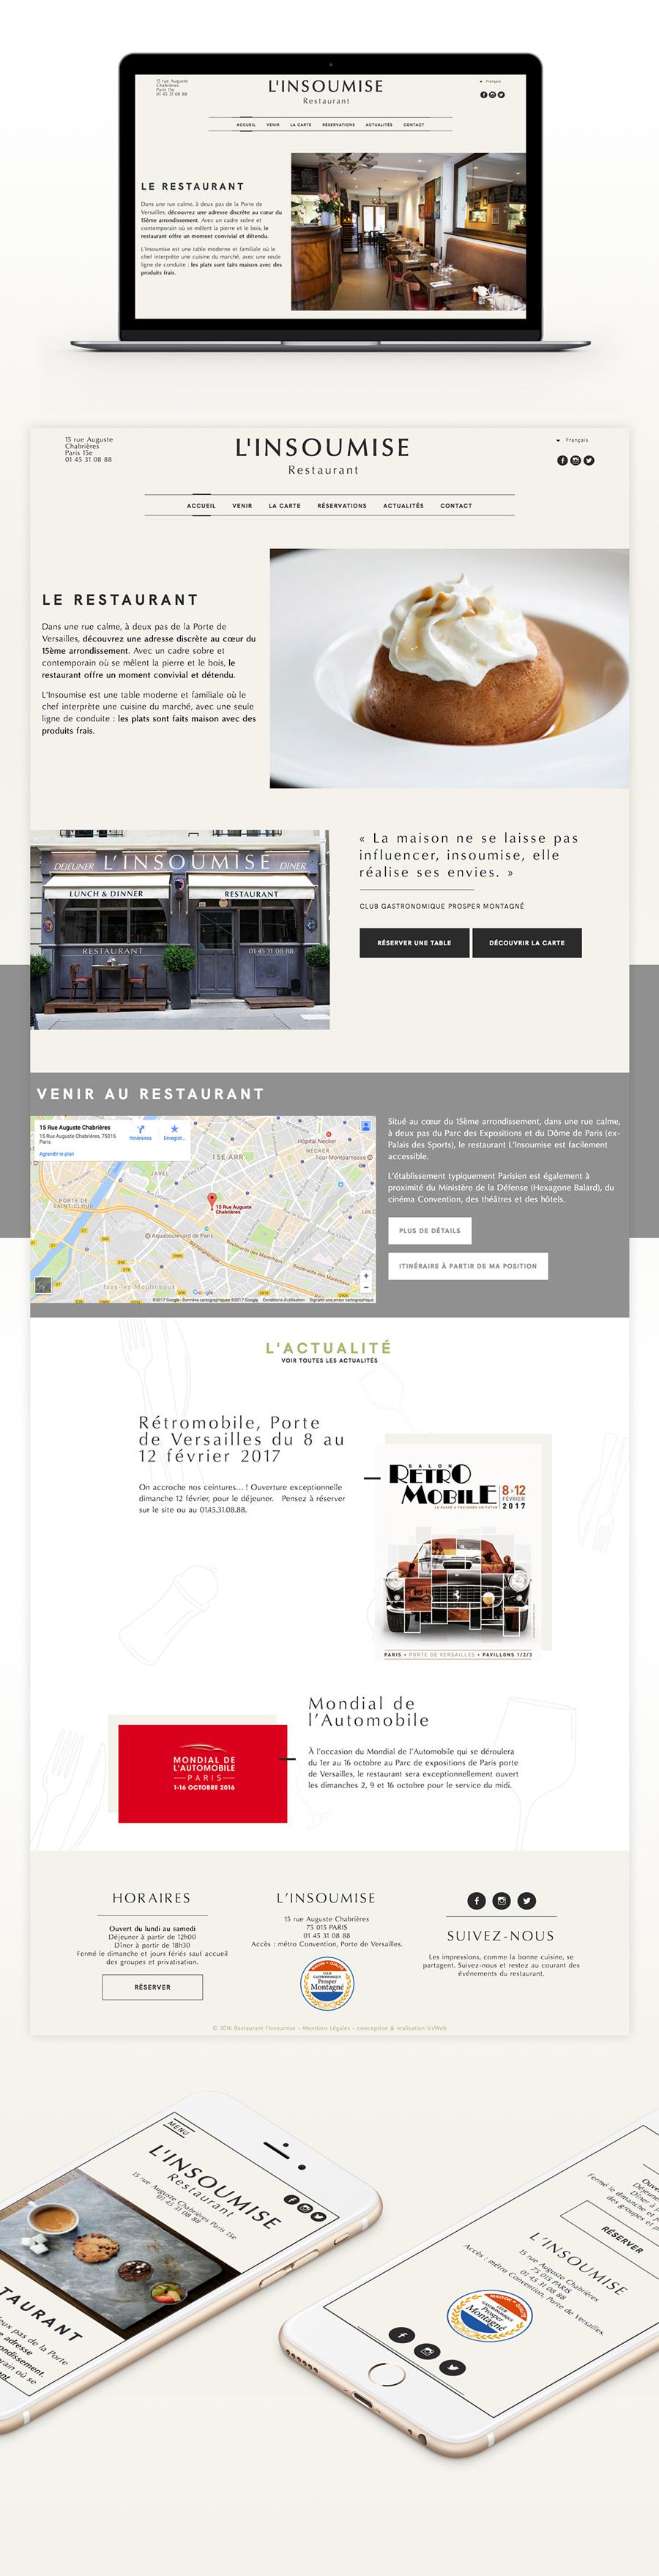 design site restaurant l'insoumise